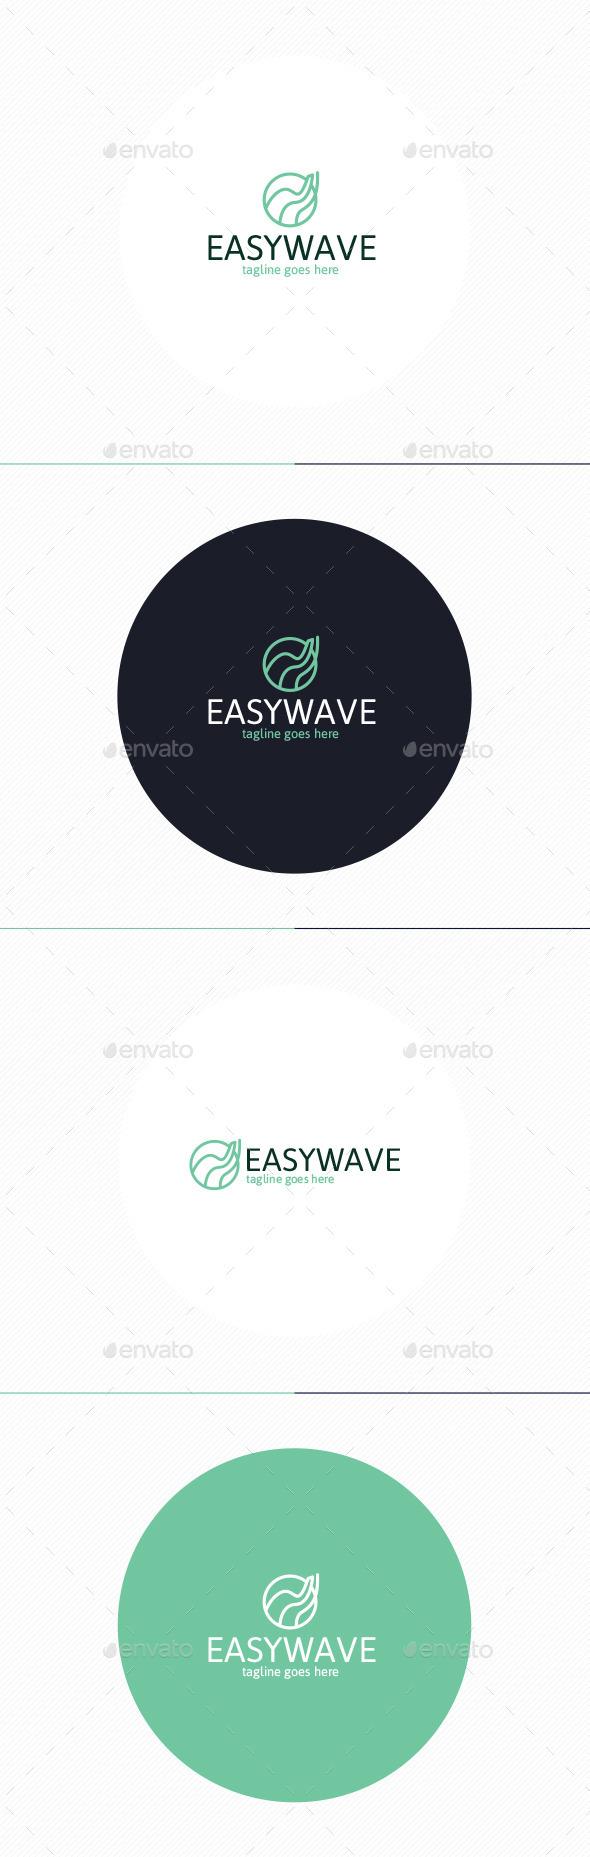 Easy Wave Logo - Vector Abstract